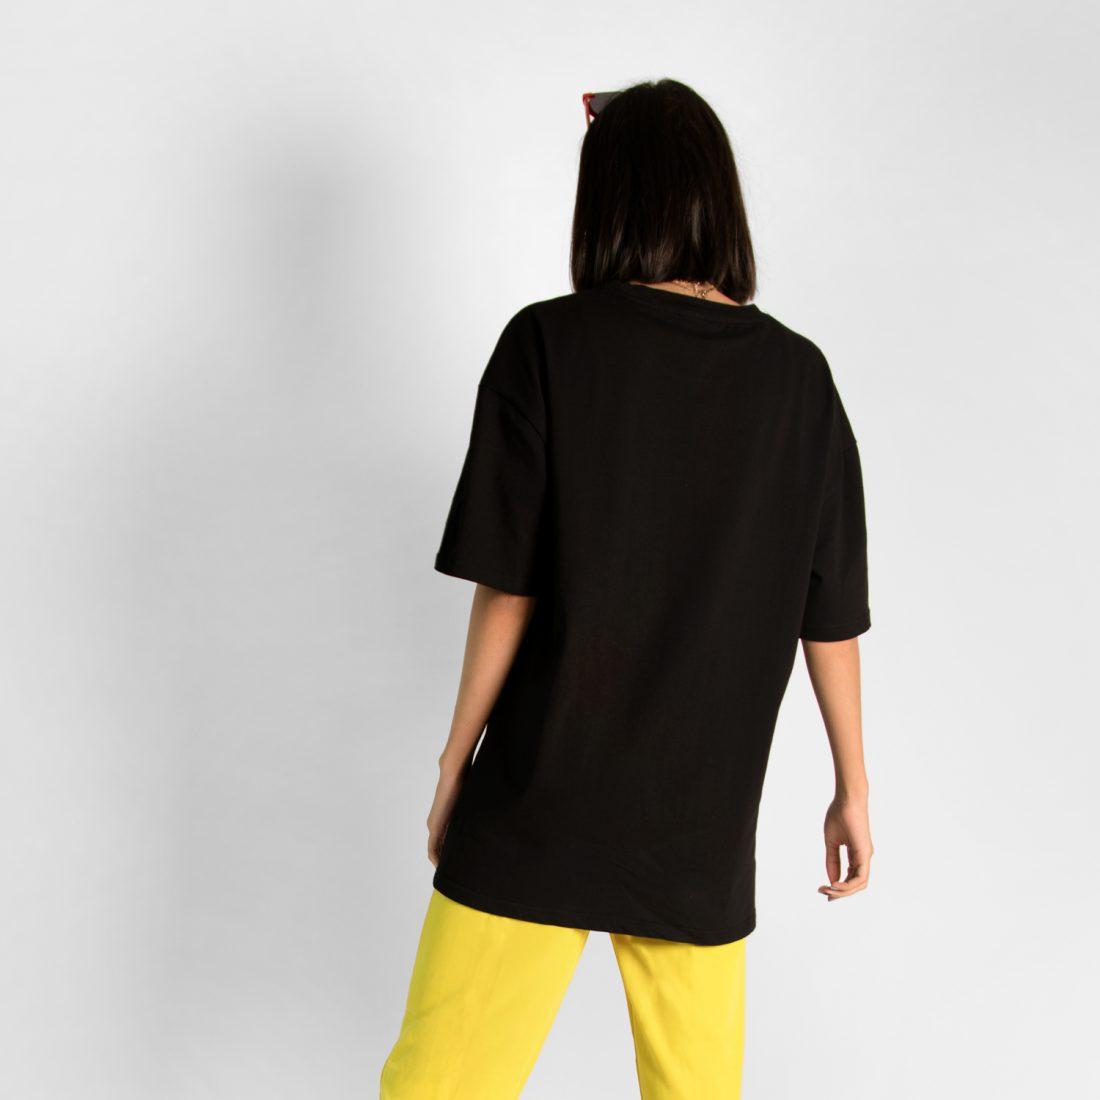 W_arabicshirt5